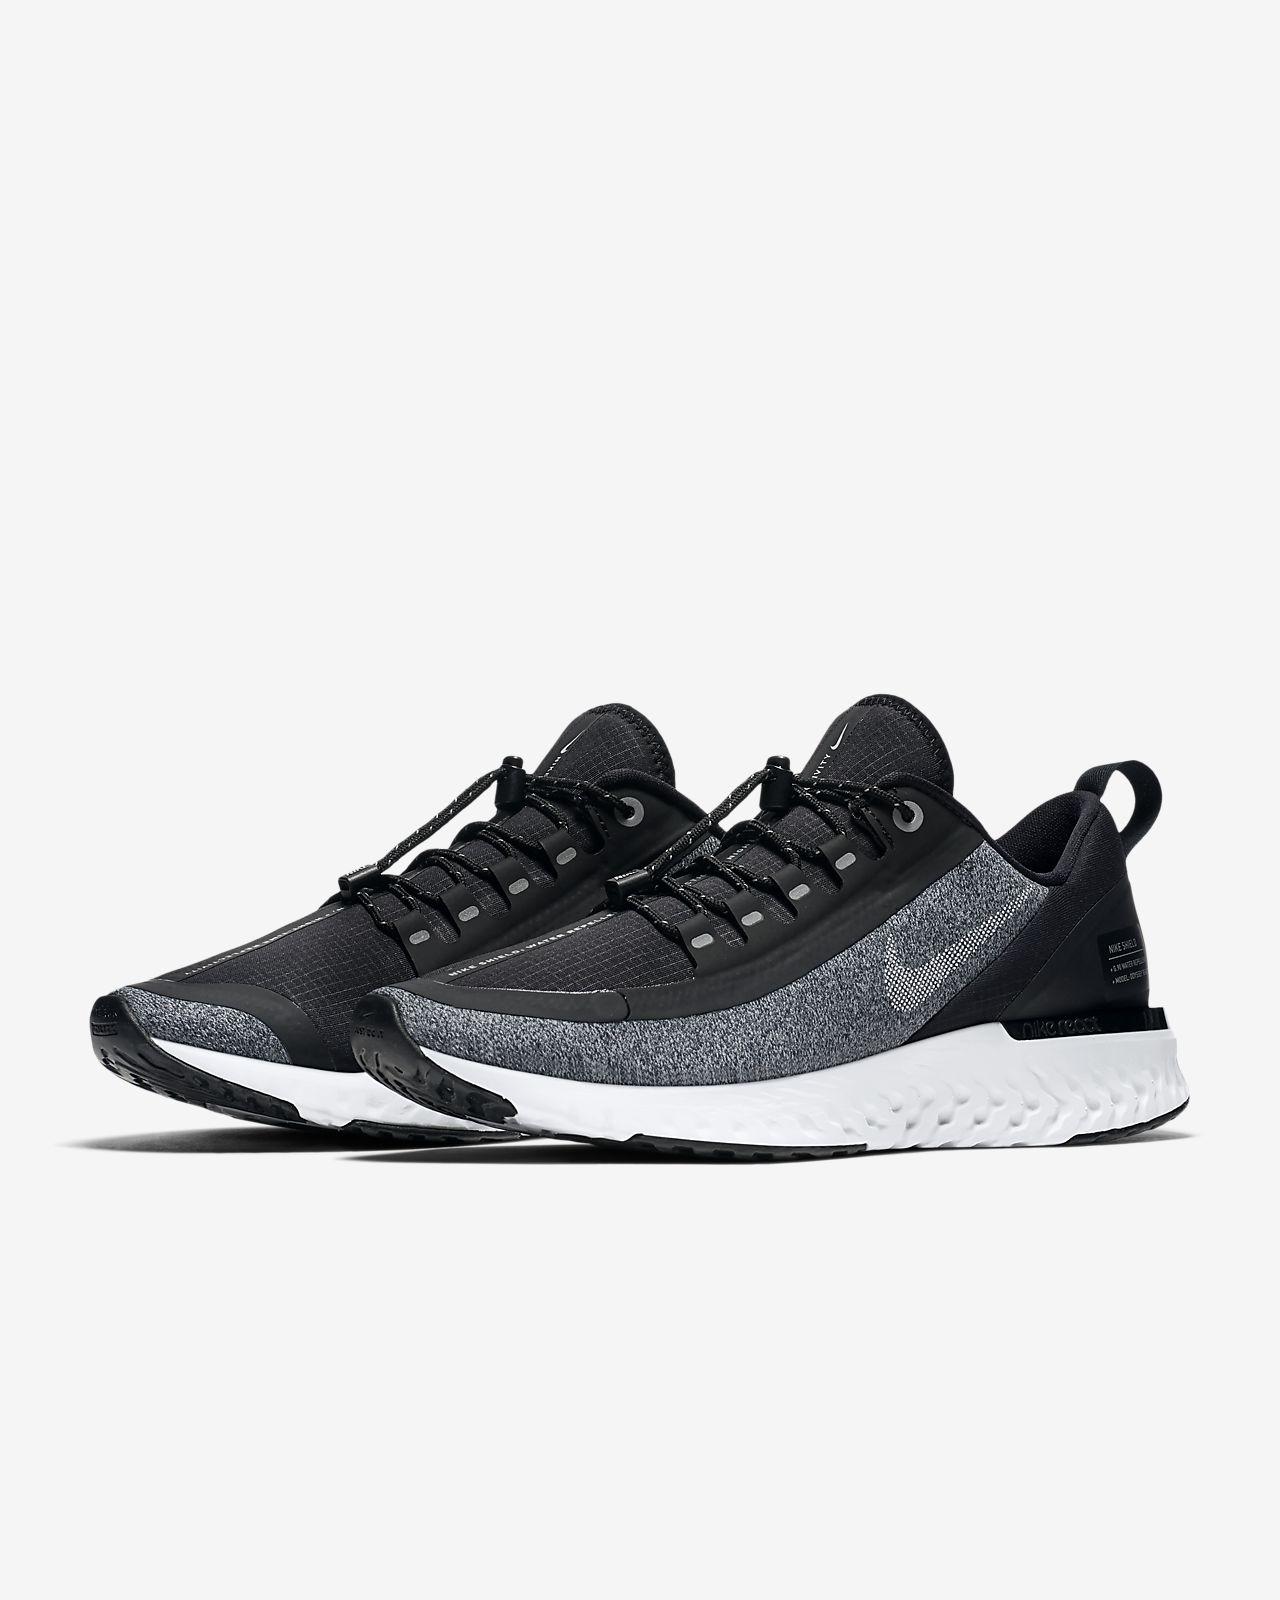 925dfa0f6edf4 Nike Odyssey React Shield Water-Repellent Women s Running Shoe. Nike ...